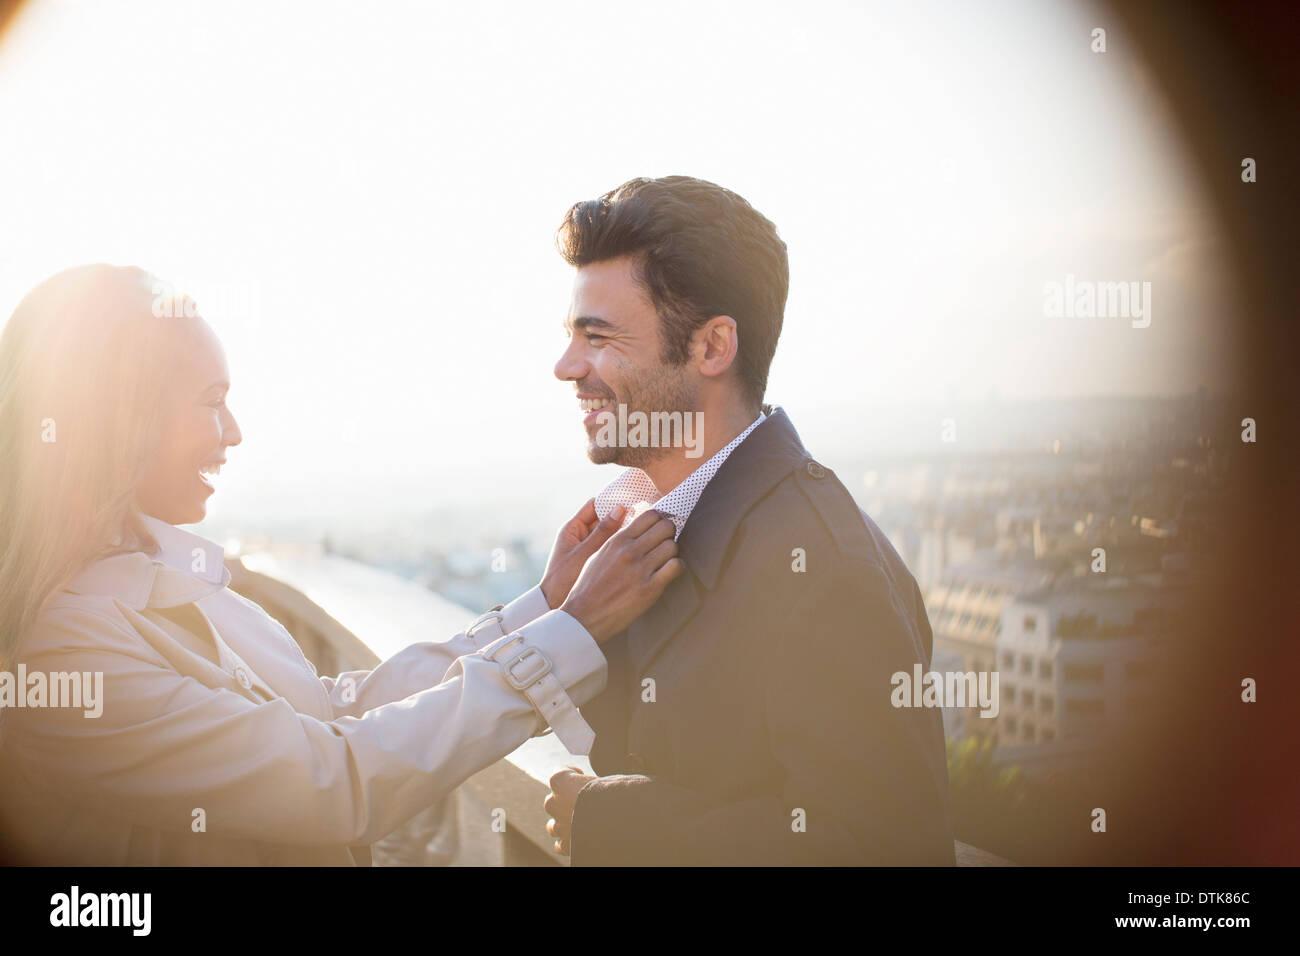 Woman holding boyfriend's collar on urban balcony - Stock Image